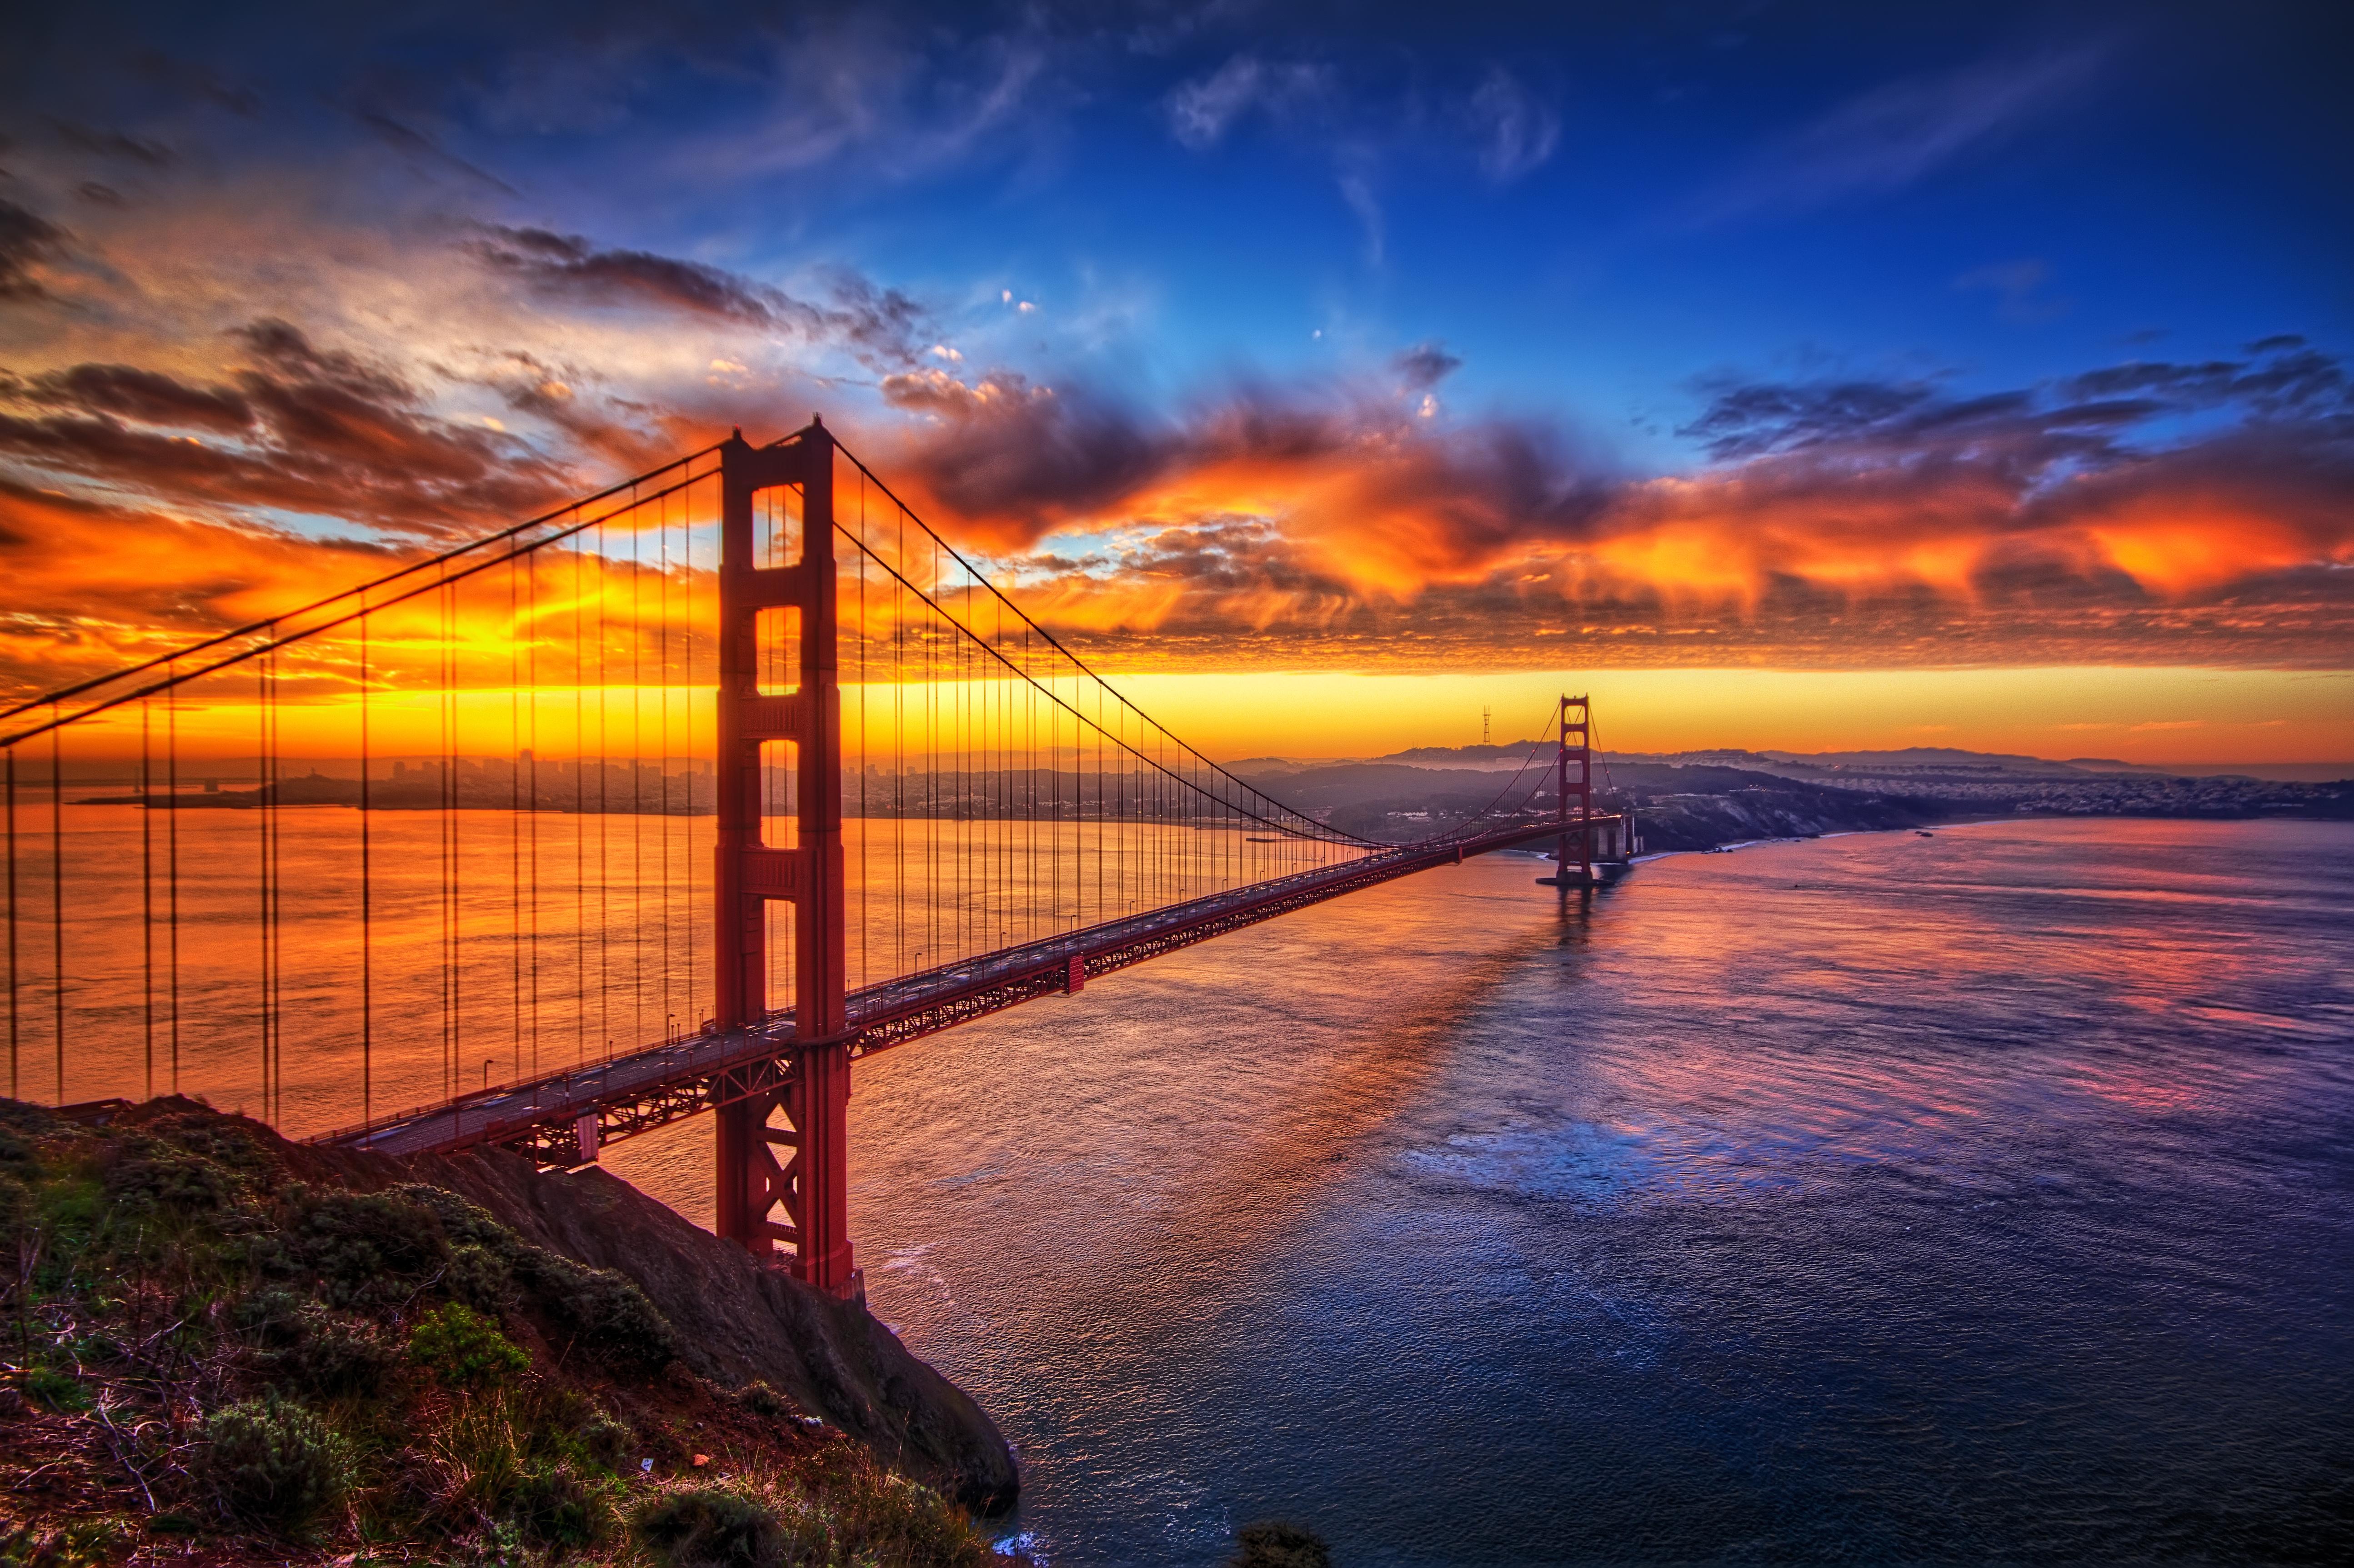 Golden Gate Bridge High Definition Wallpapers